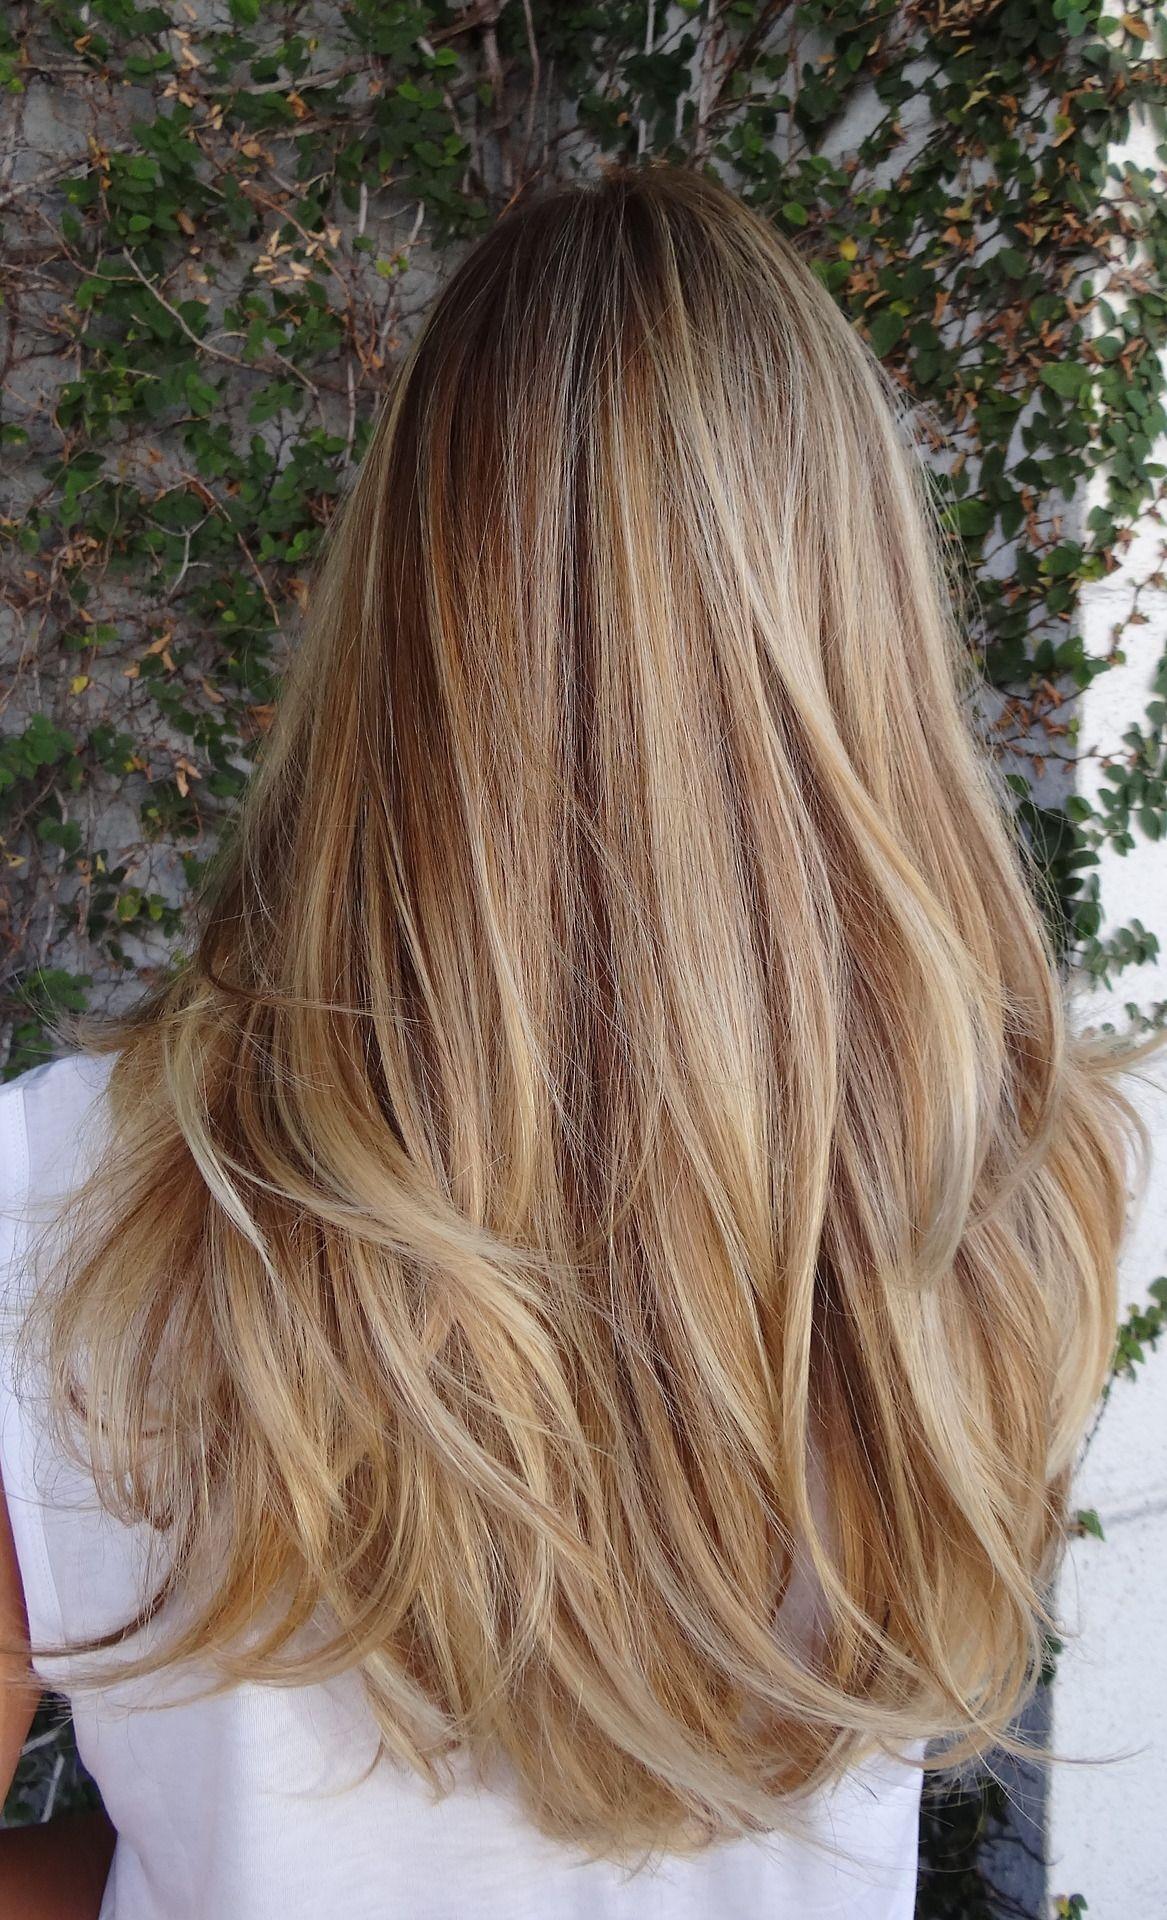 On Colour Ground Honey Blonde Hair Blonde Hair Looks Hair Styles